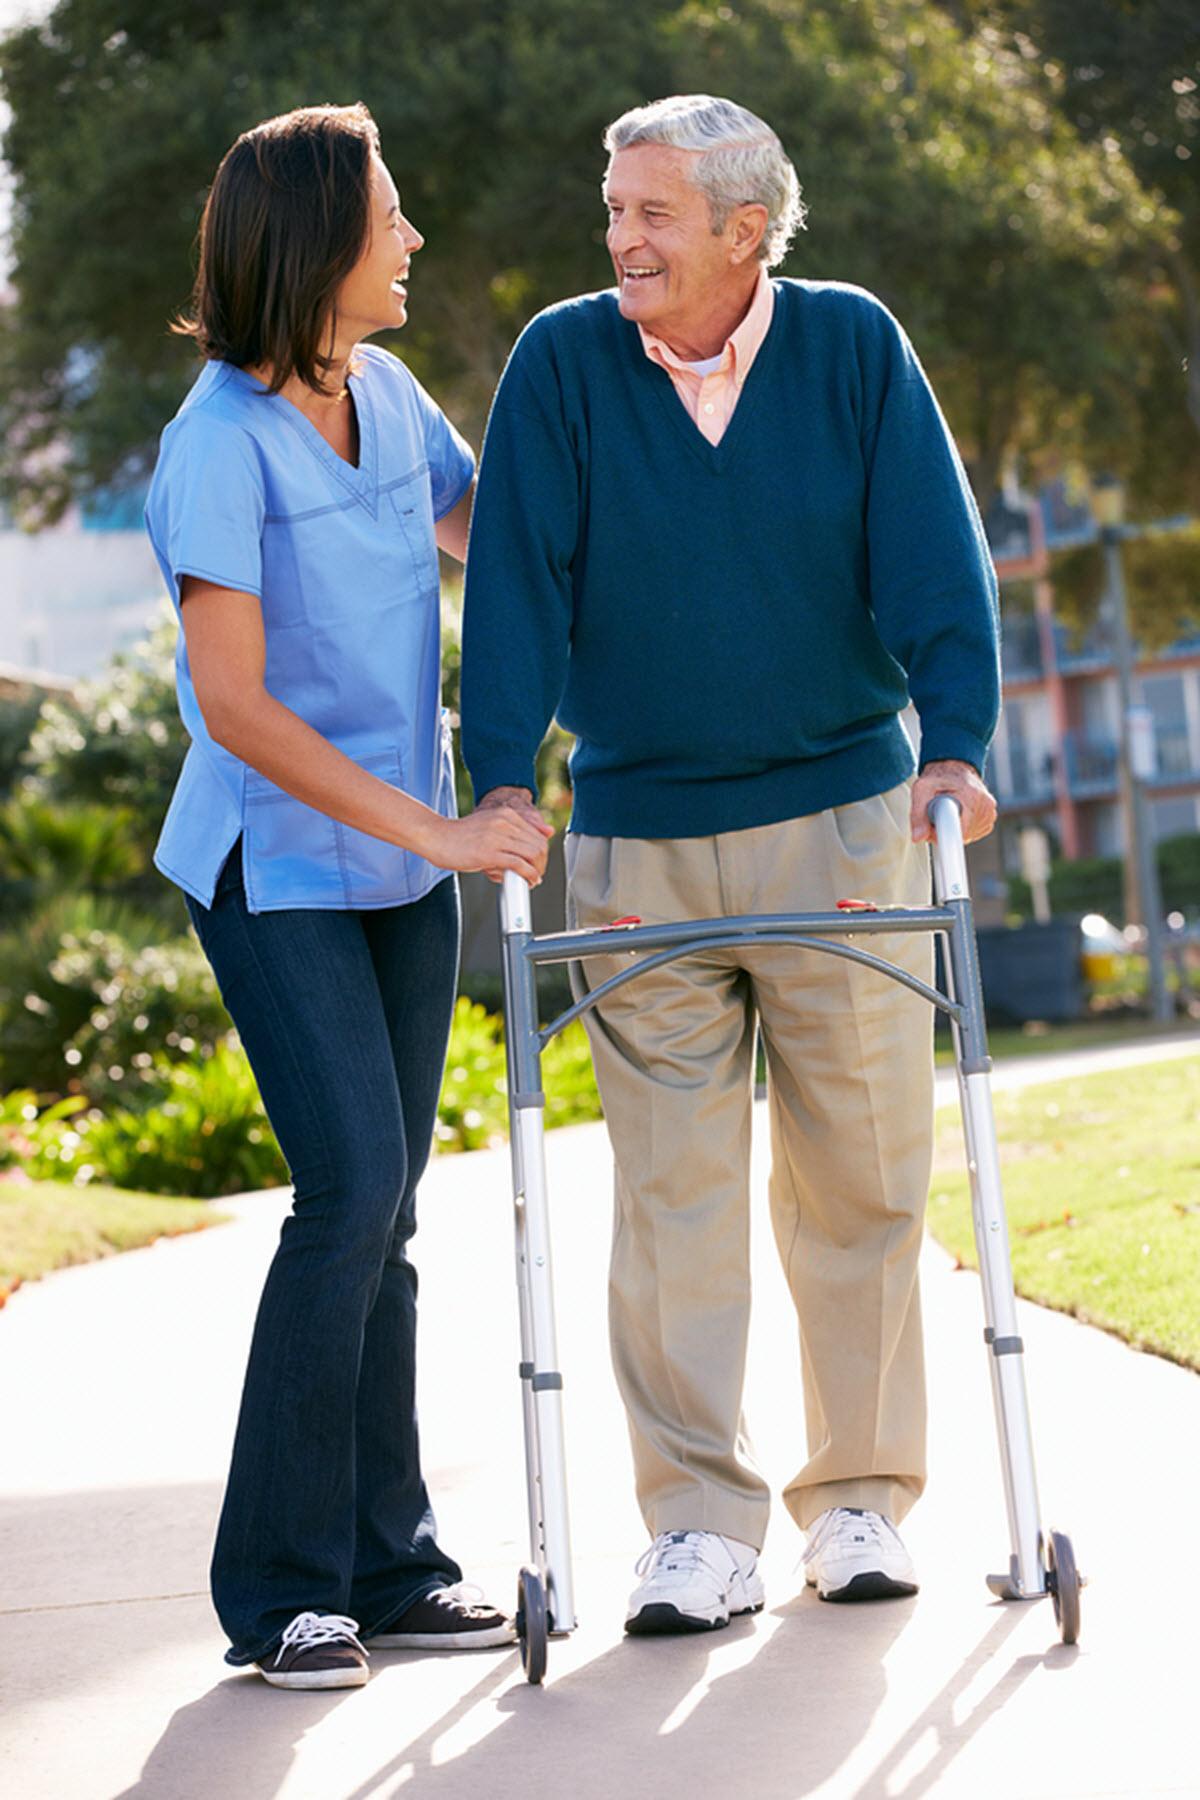 Elder Care in Yuba City CA: Handling Caregiving Expectations